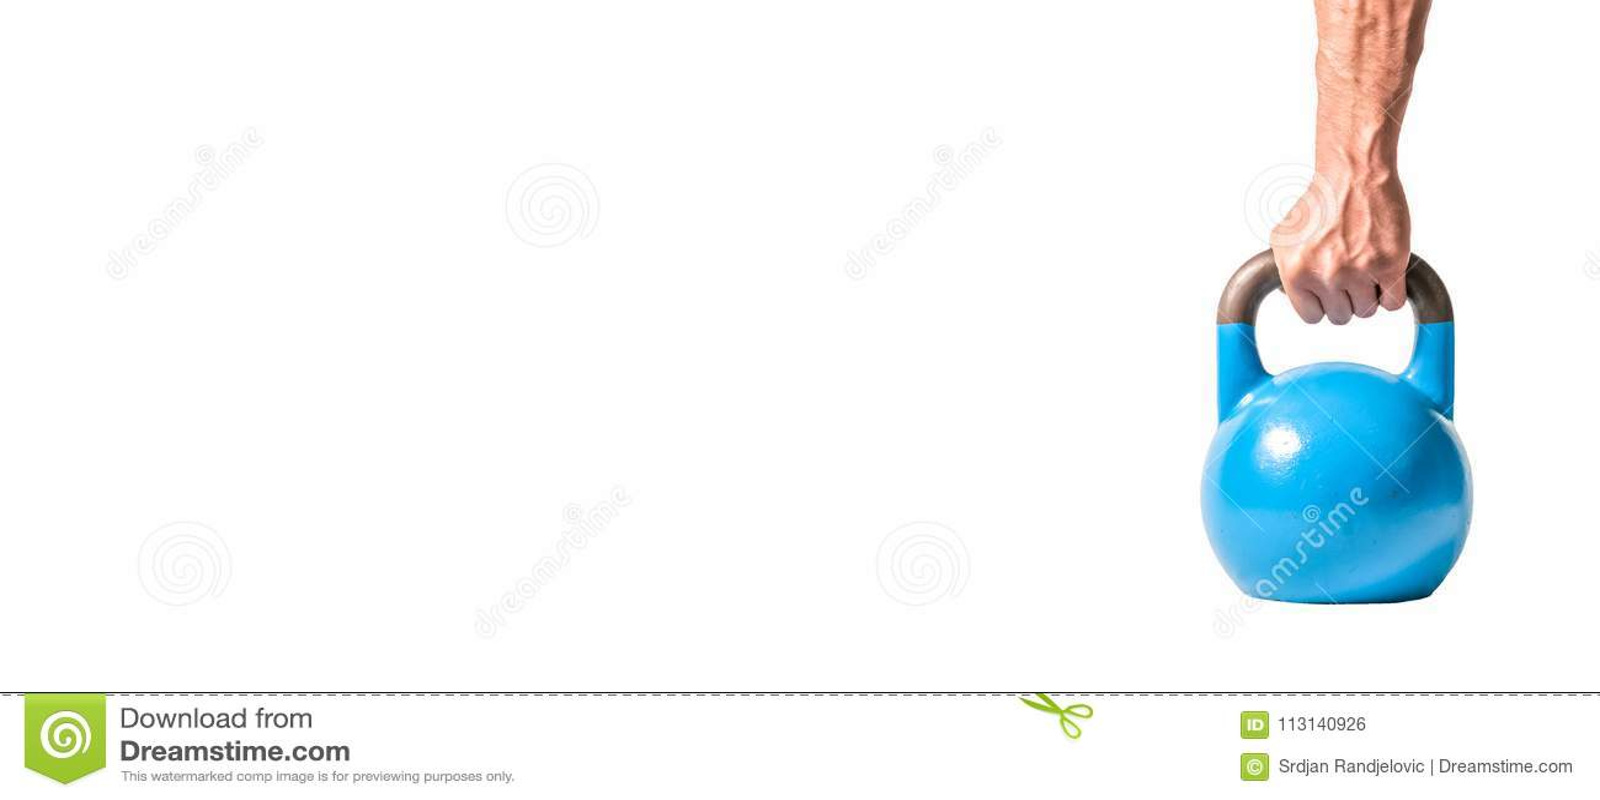 Sterke spiermensenhand met spieren die blauwe zware die kettlebell houden gedeeltelijk op witte achtergrond wordt geïsoleerd